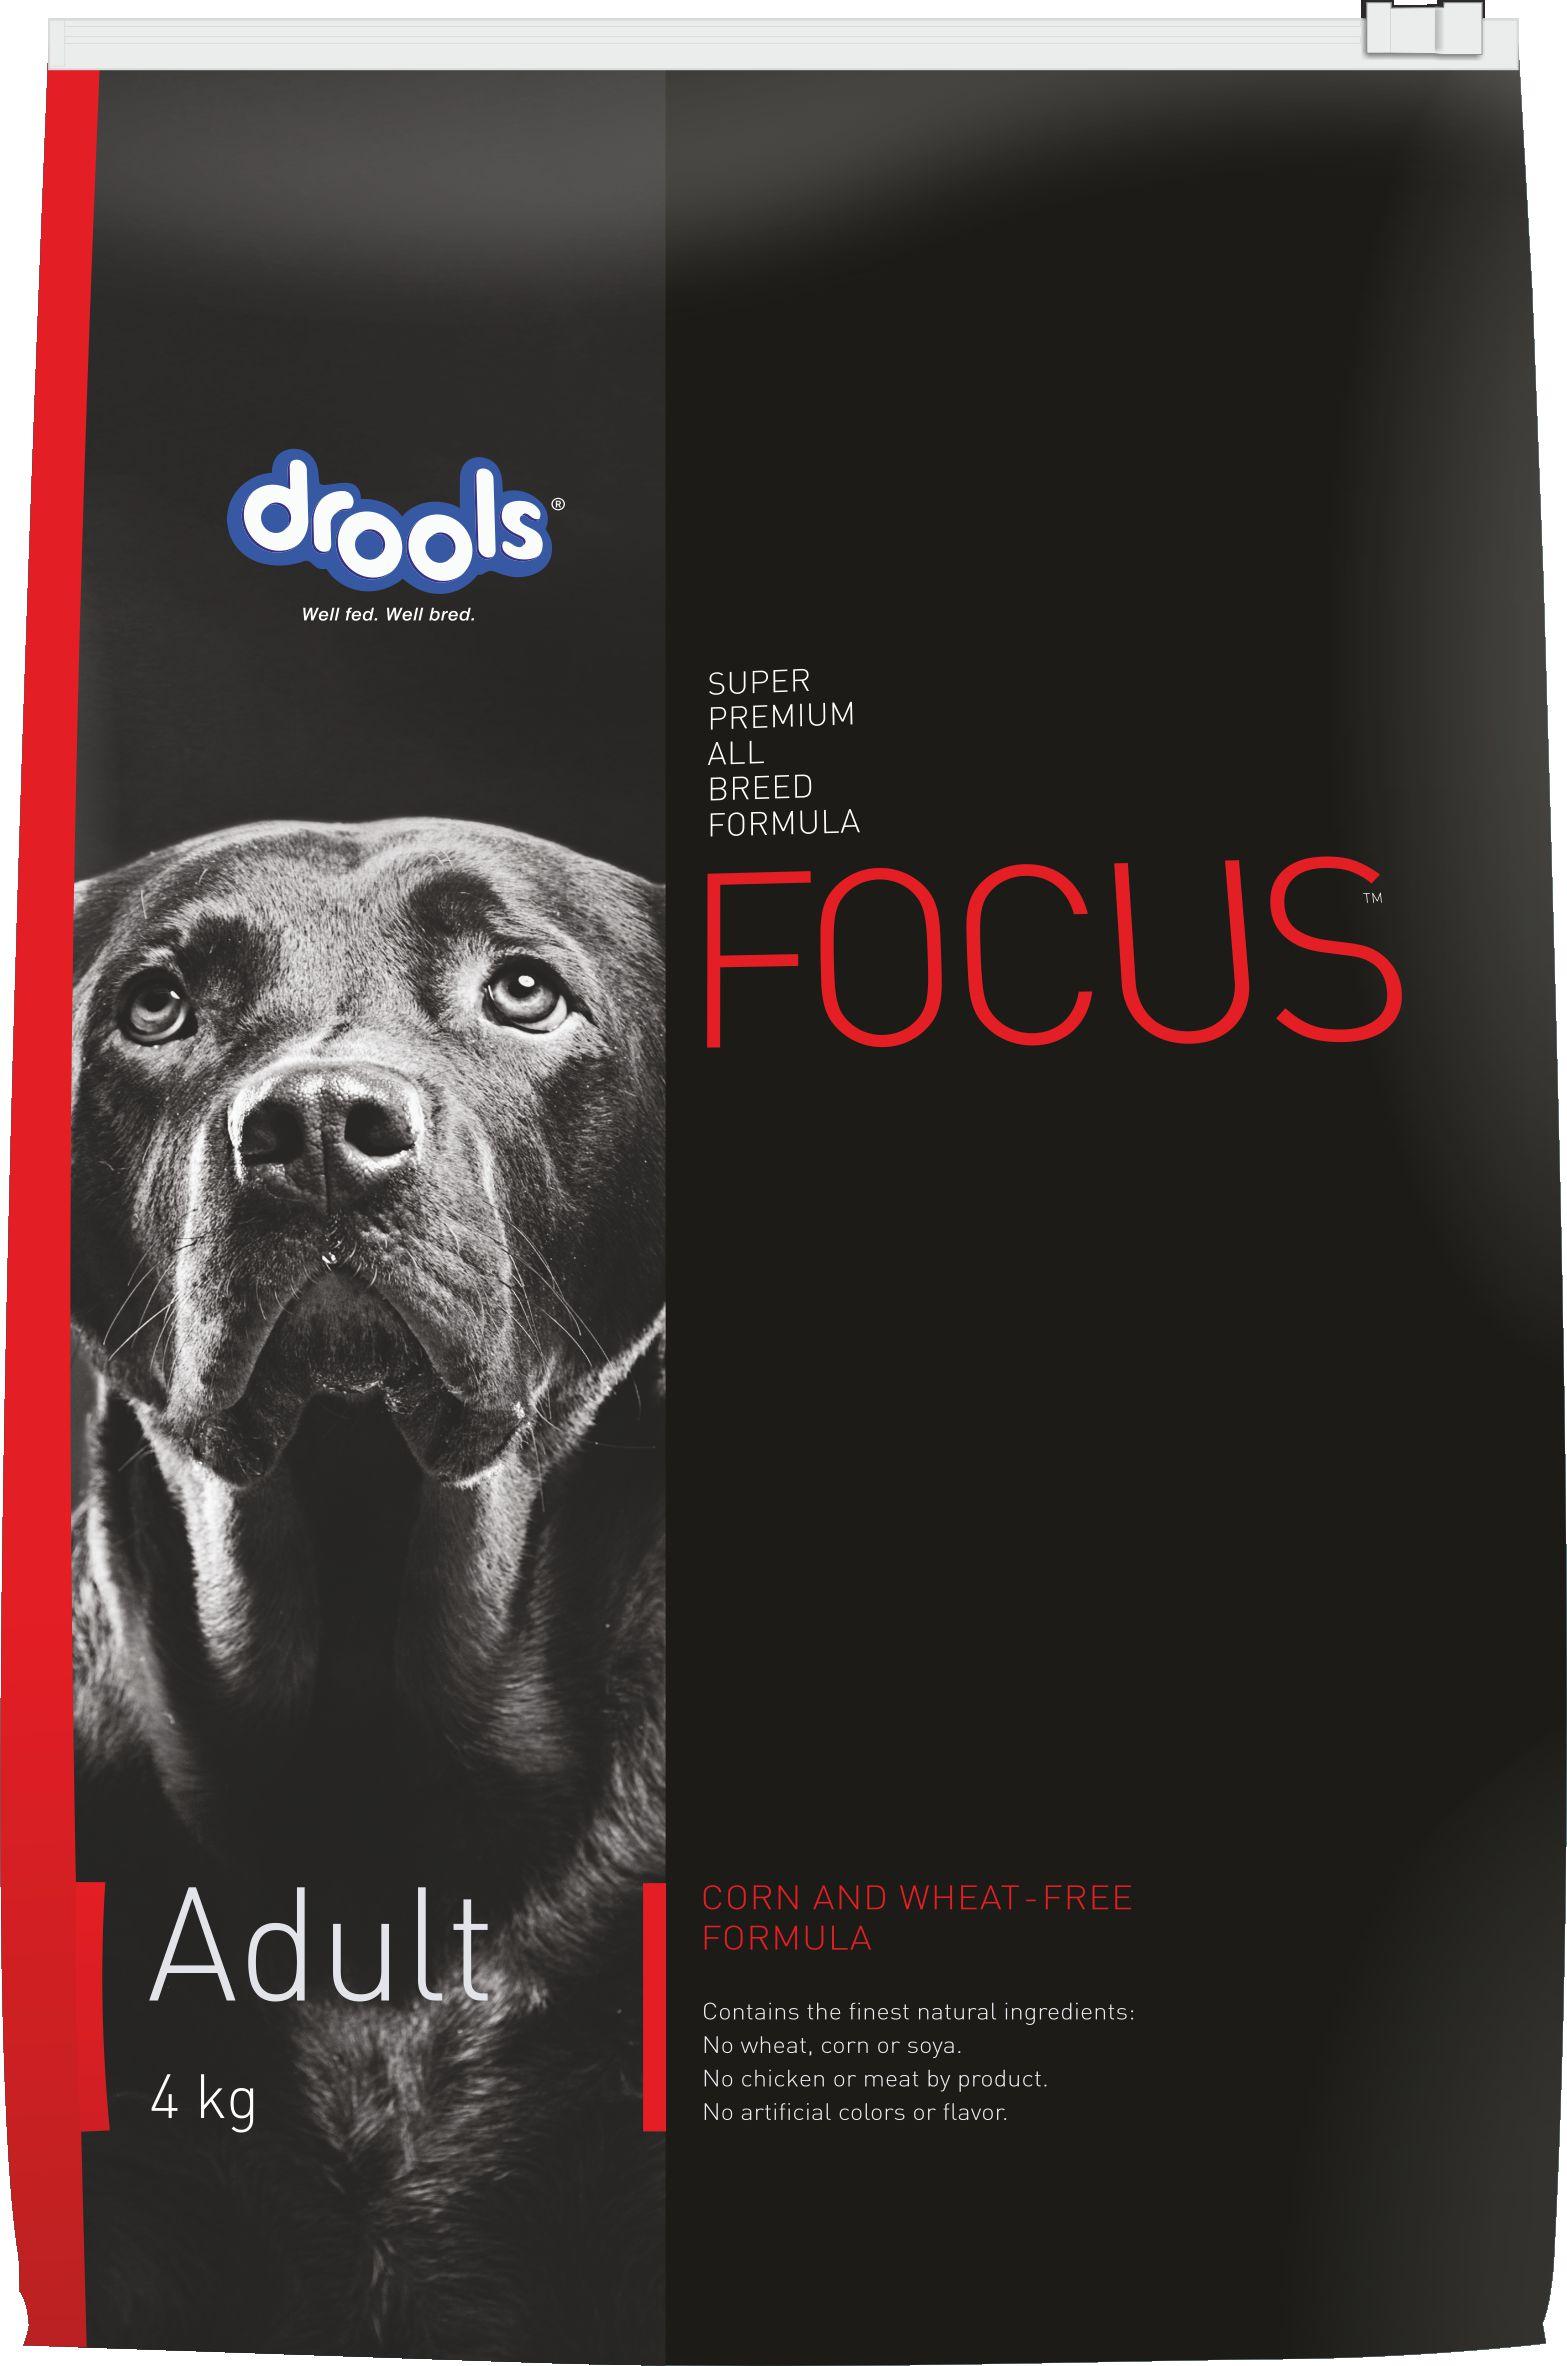 Drools Focus Adult, Super Premium Dog Food, 4kg